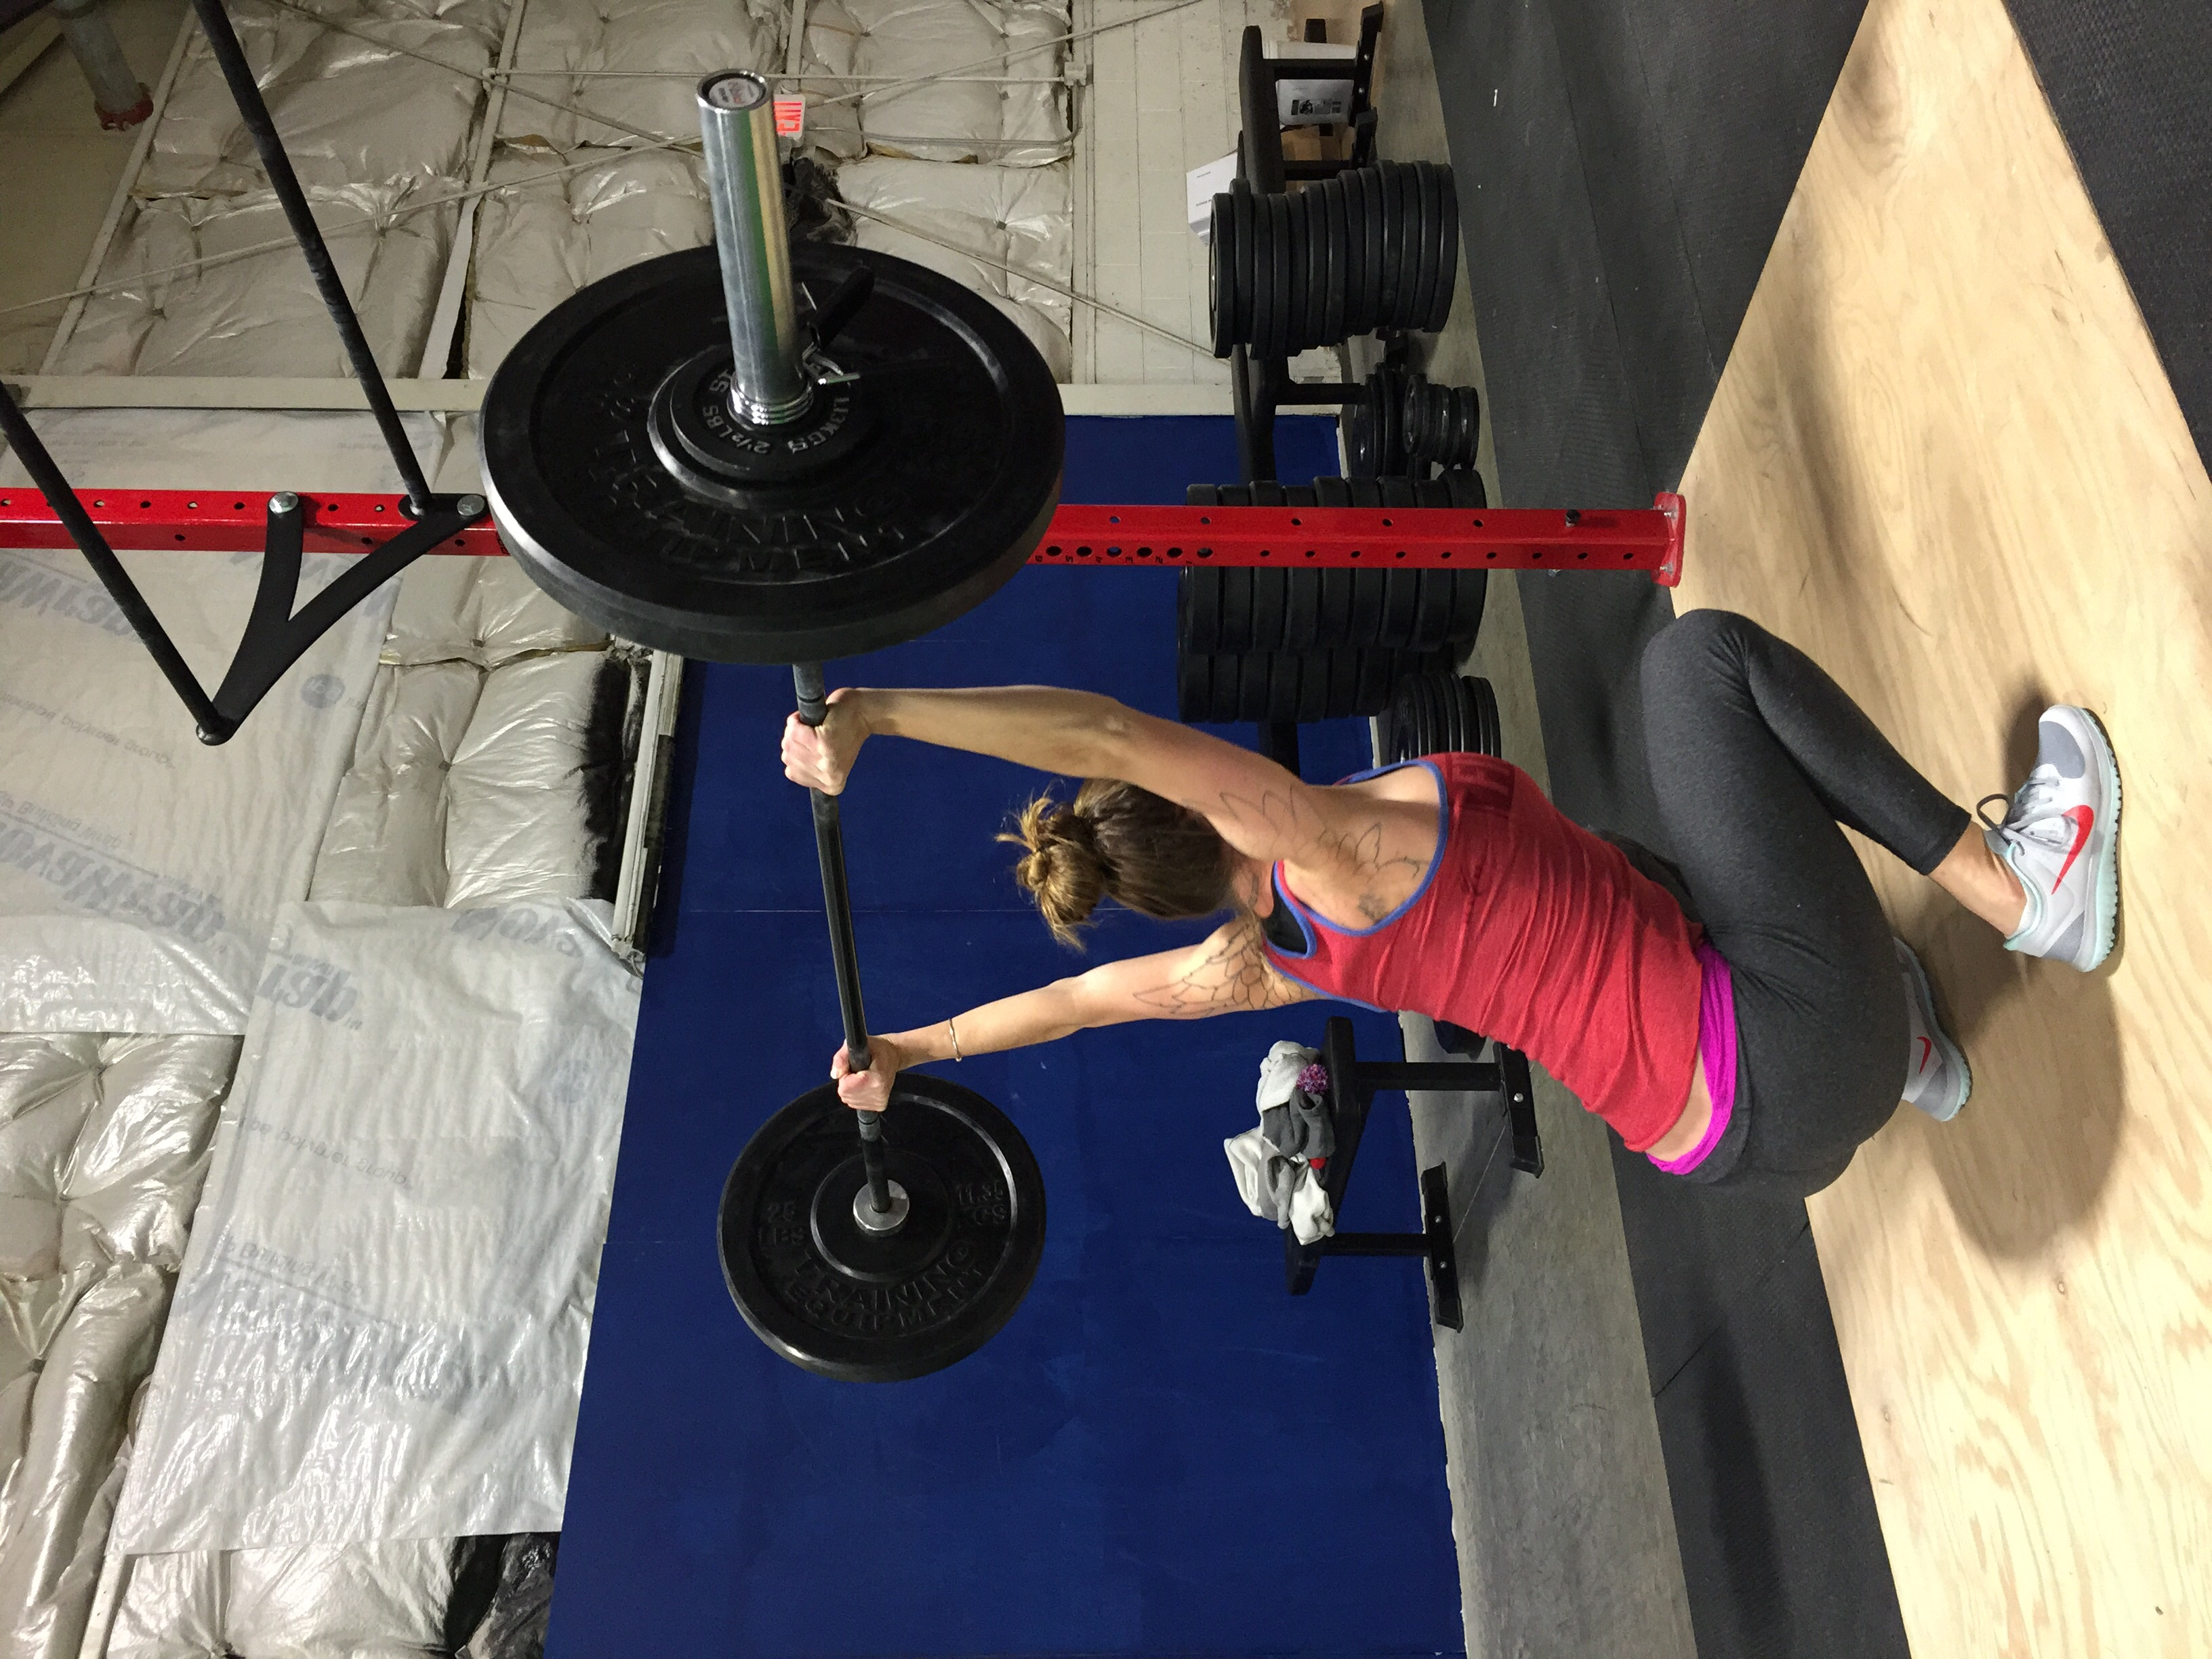 The most demanding squat possible. Amazing form!